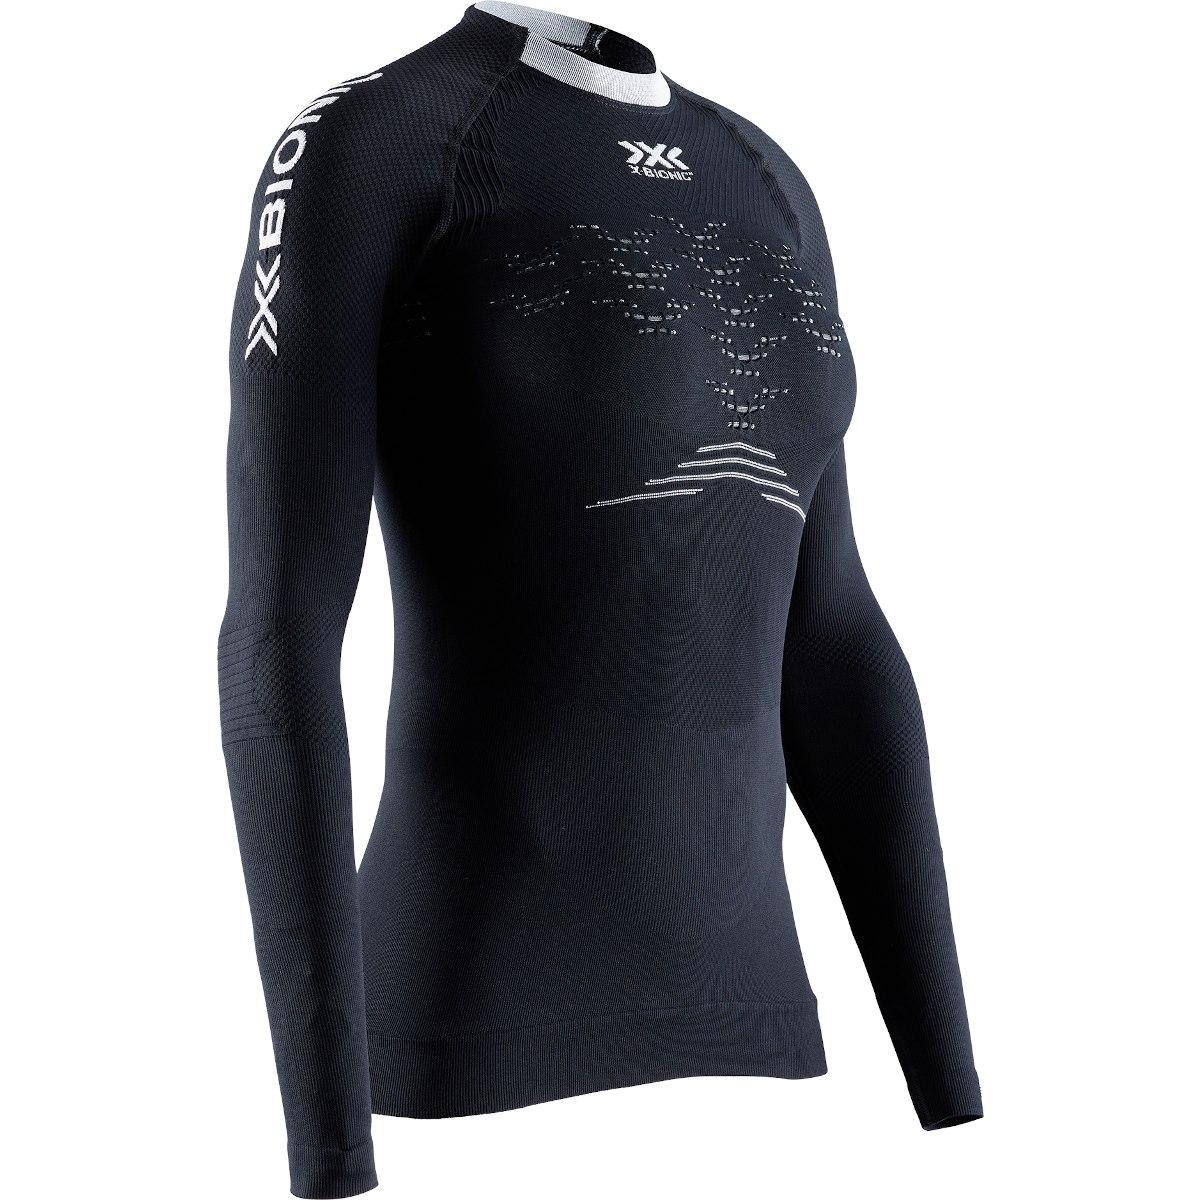 X-Bionic The Trick 4.0 Run Langarm-Laufshirt für Damen - opal black/arctic white